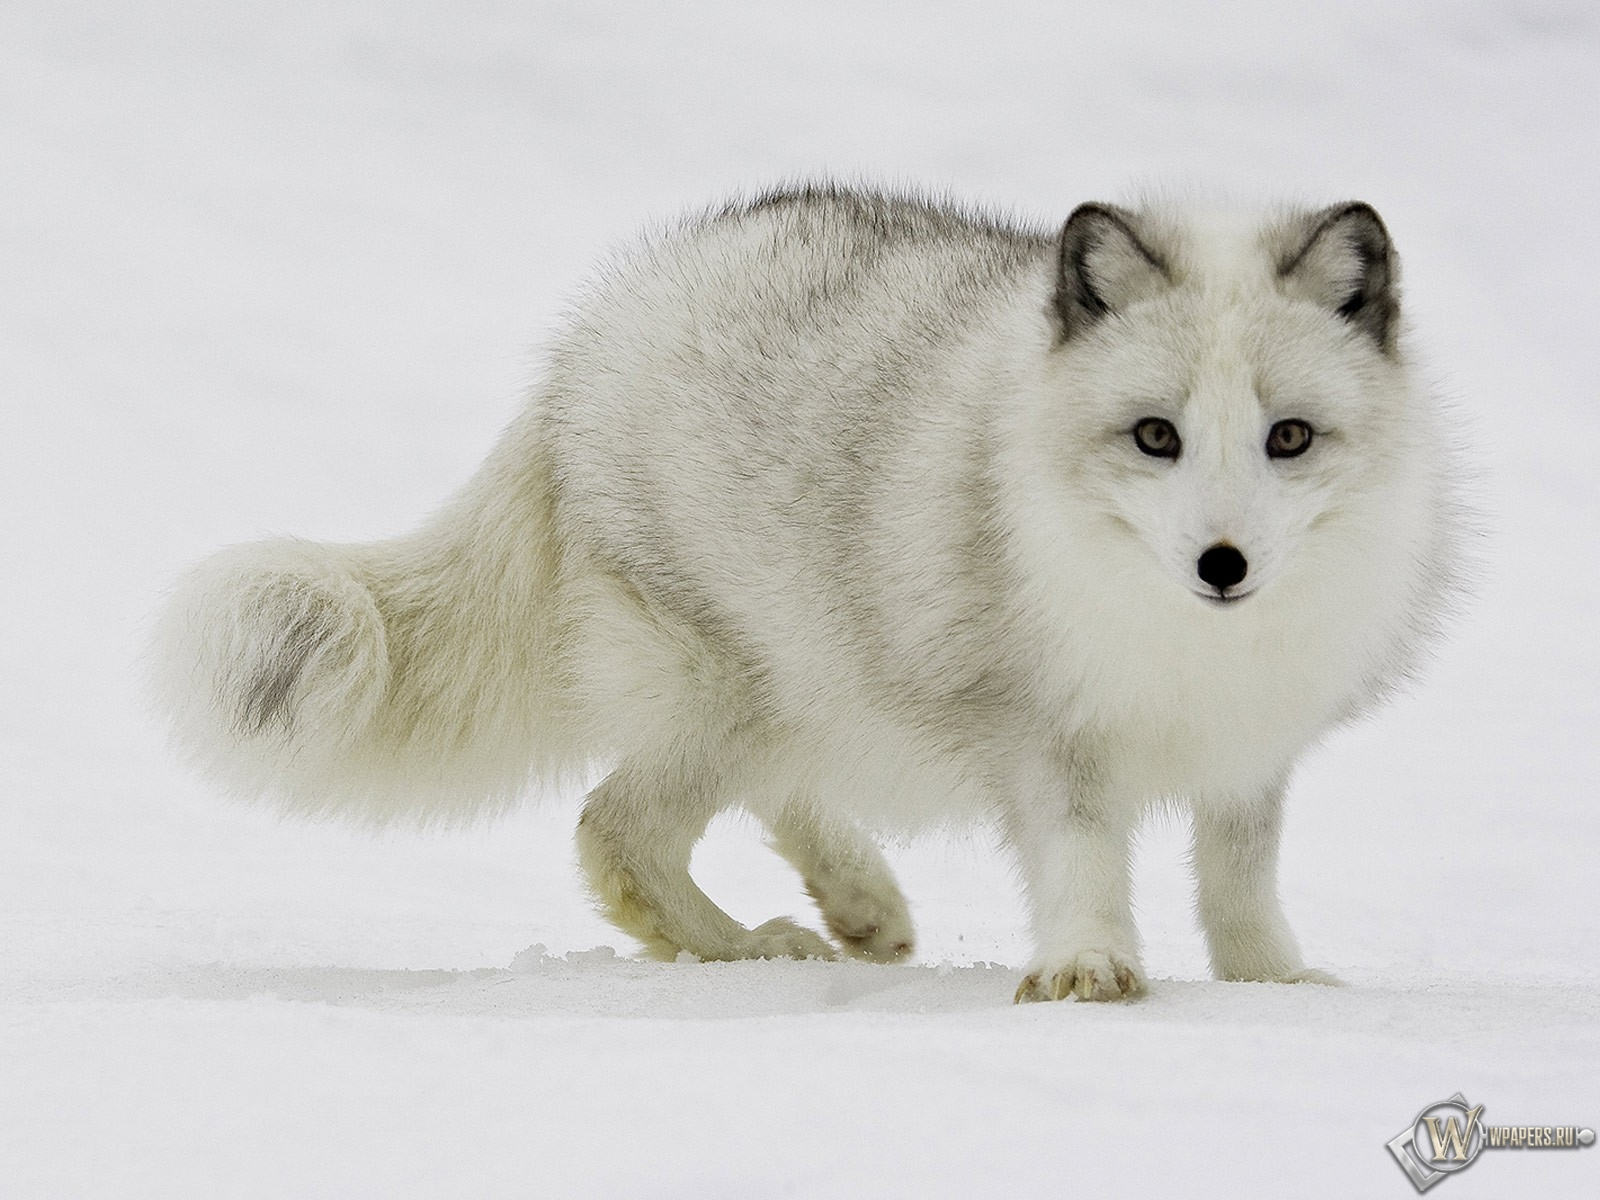 Белый песец на снегу 1600x1200